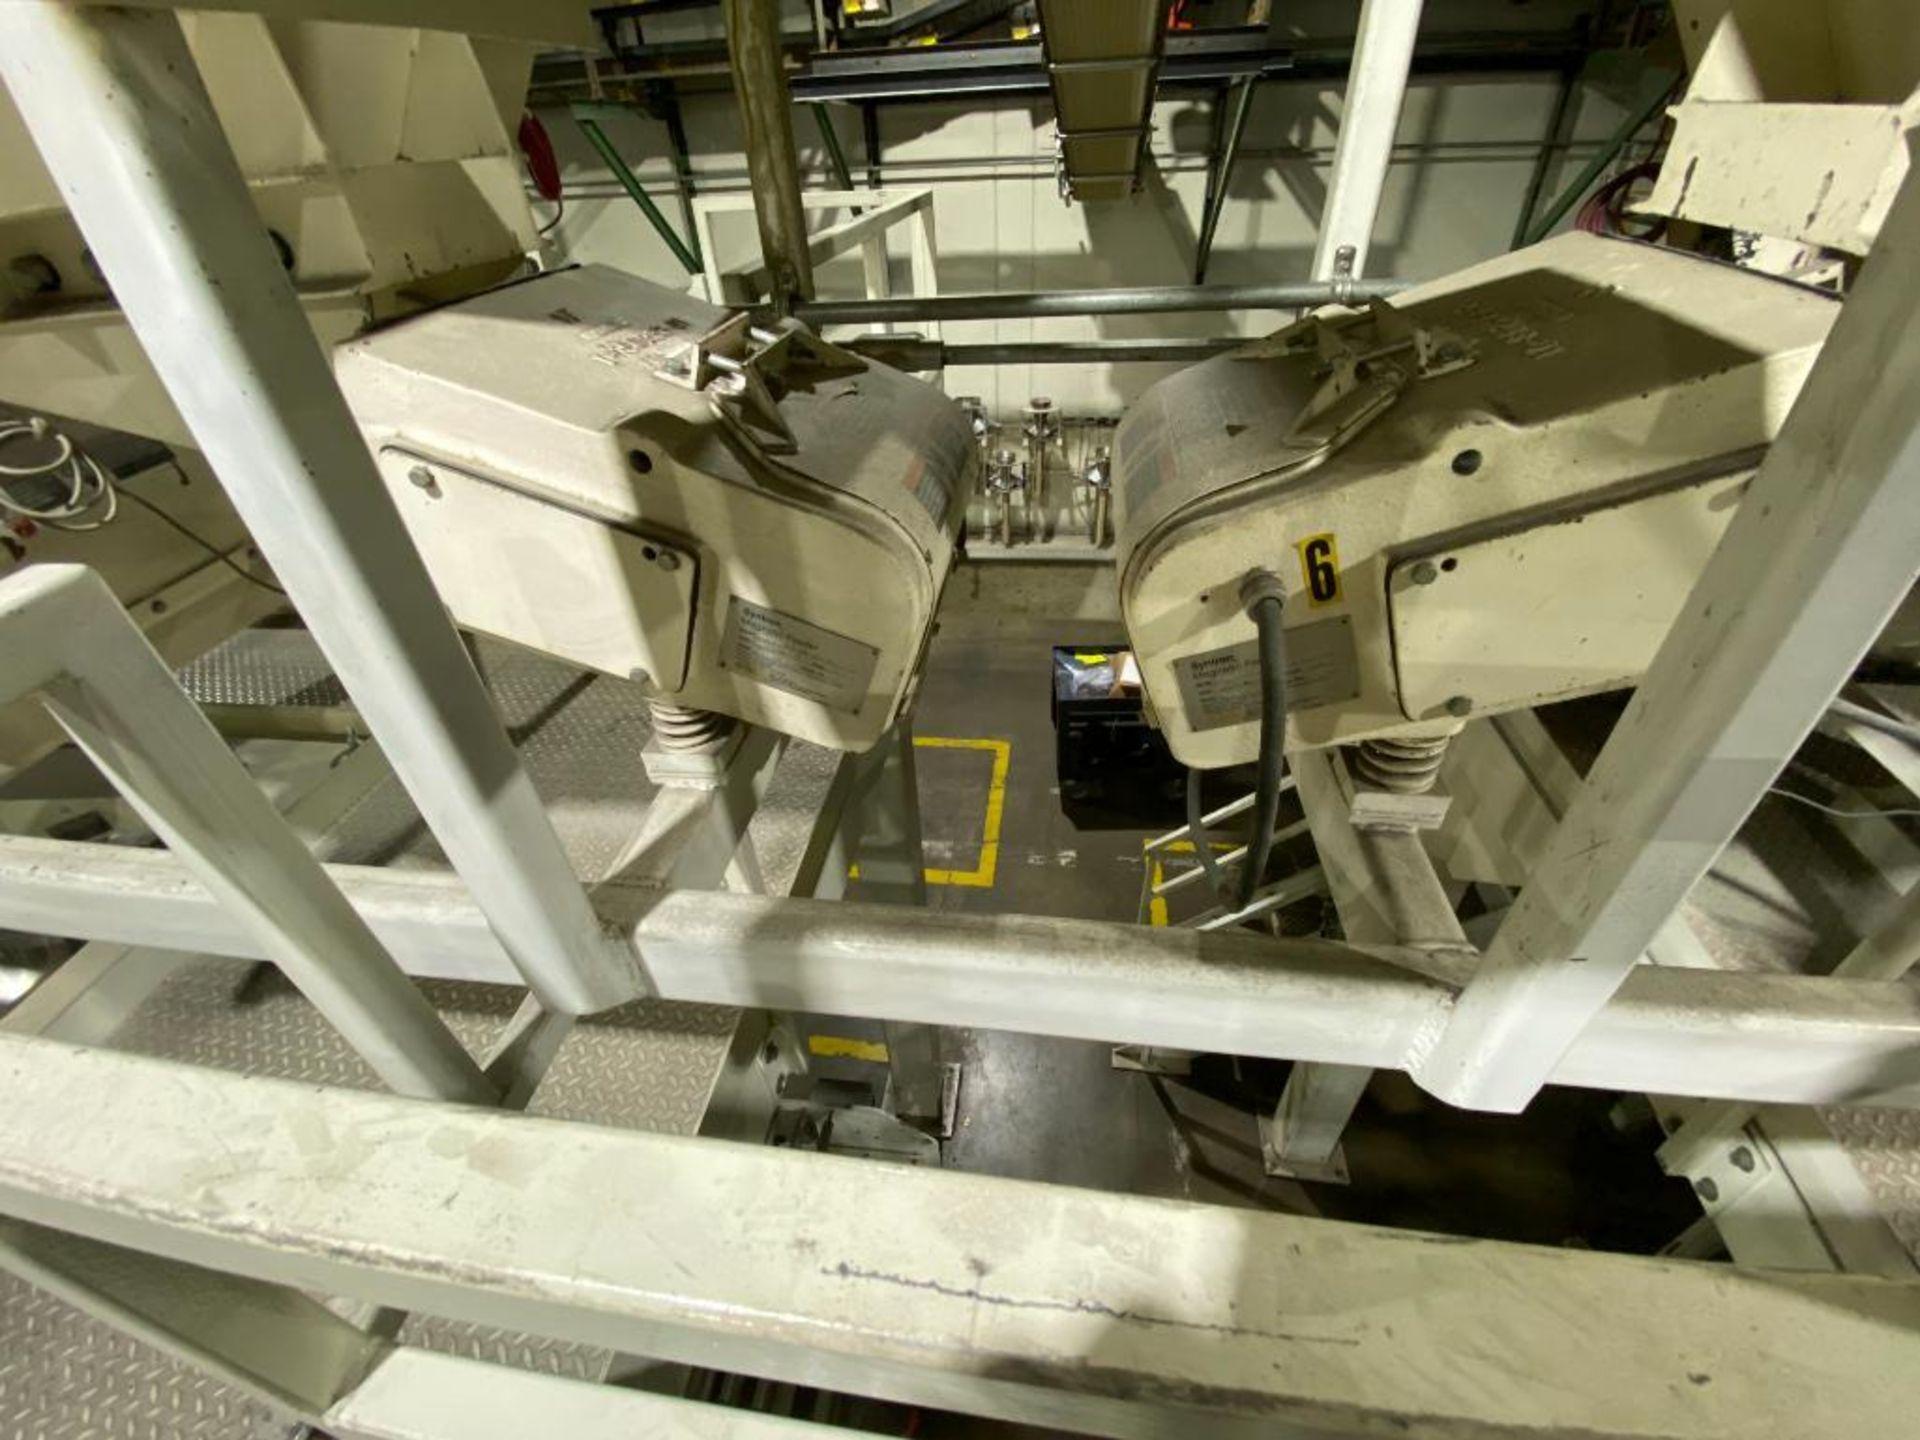 Aseeco bulk accumulation bin - Image 8 of 13